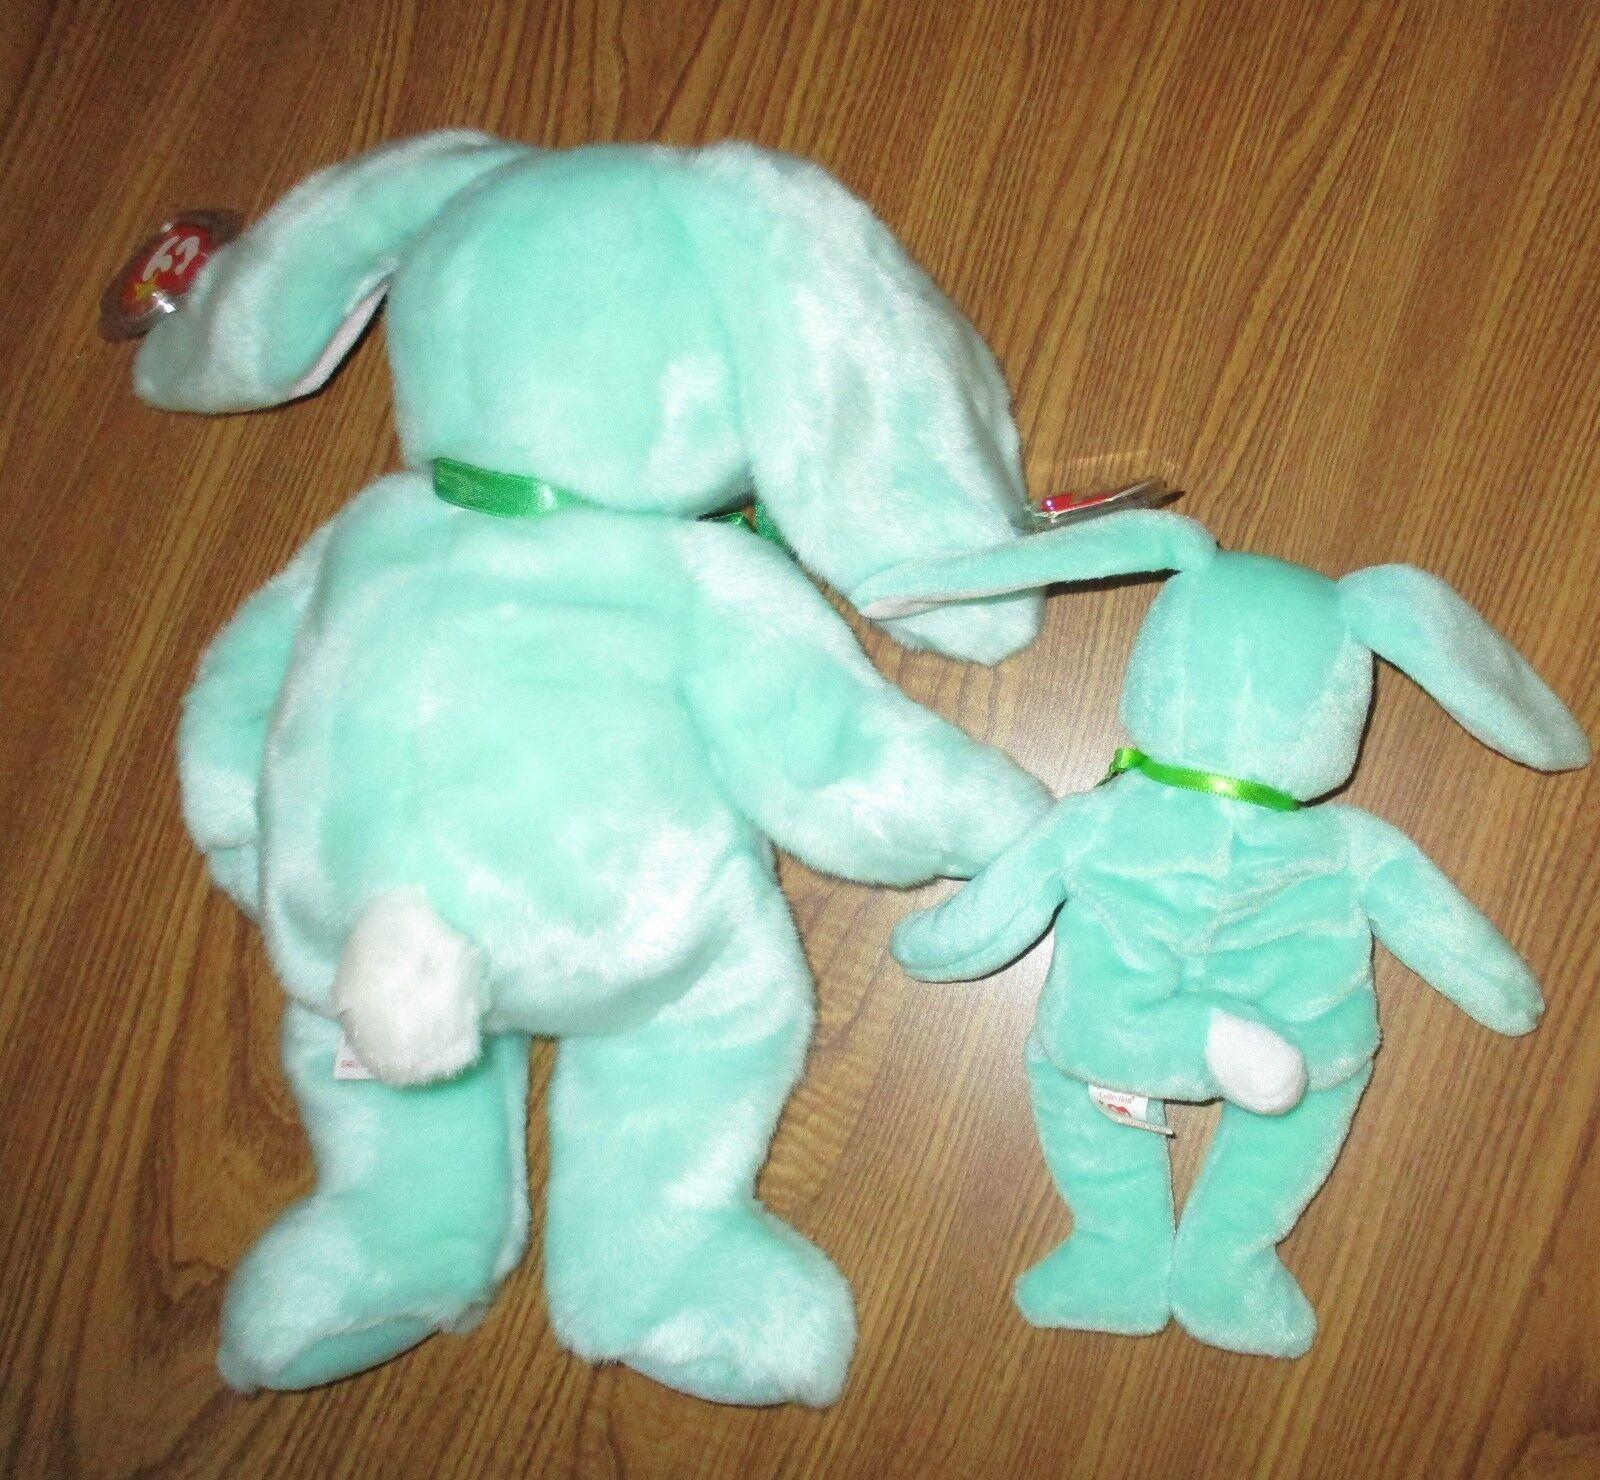 '96 TY Beanie HIPPITY the the the Mint Green Bunny w Errors + Beanie Buddy '98, NWT MINT 59dbc6